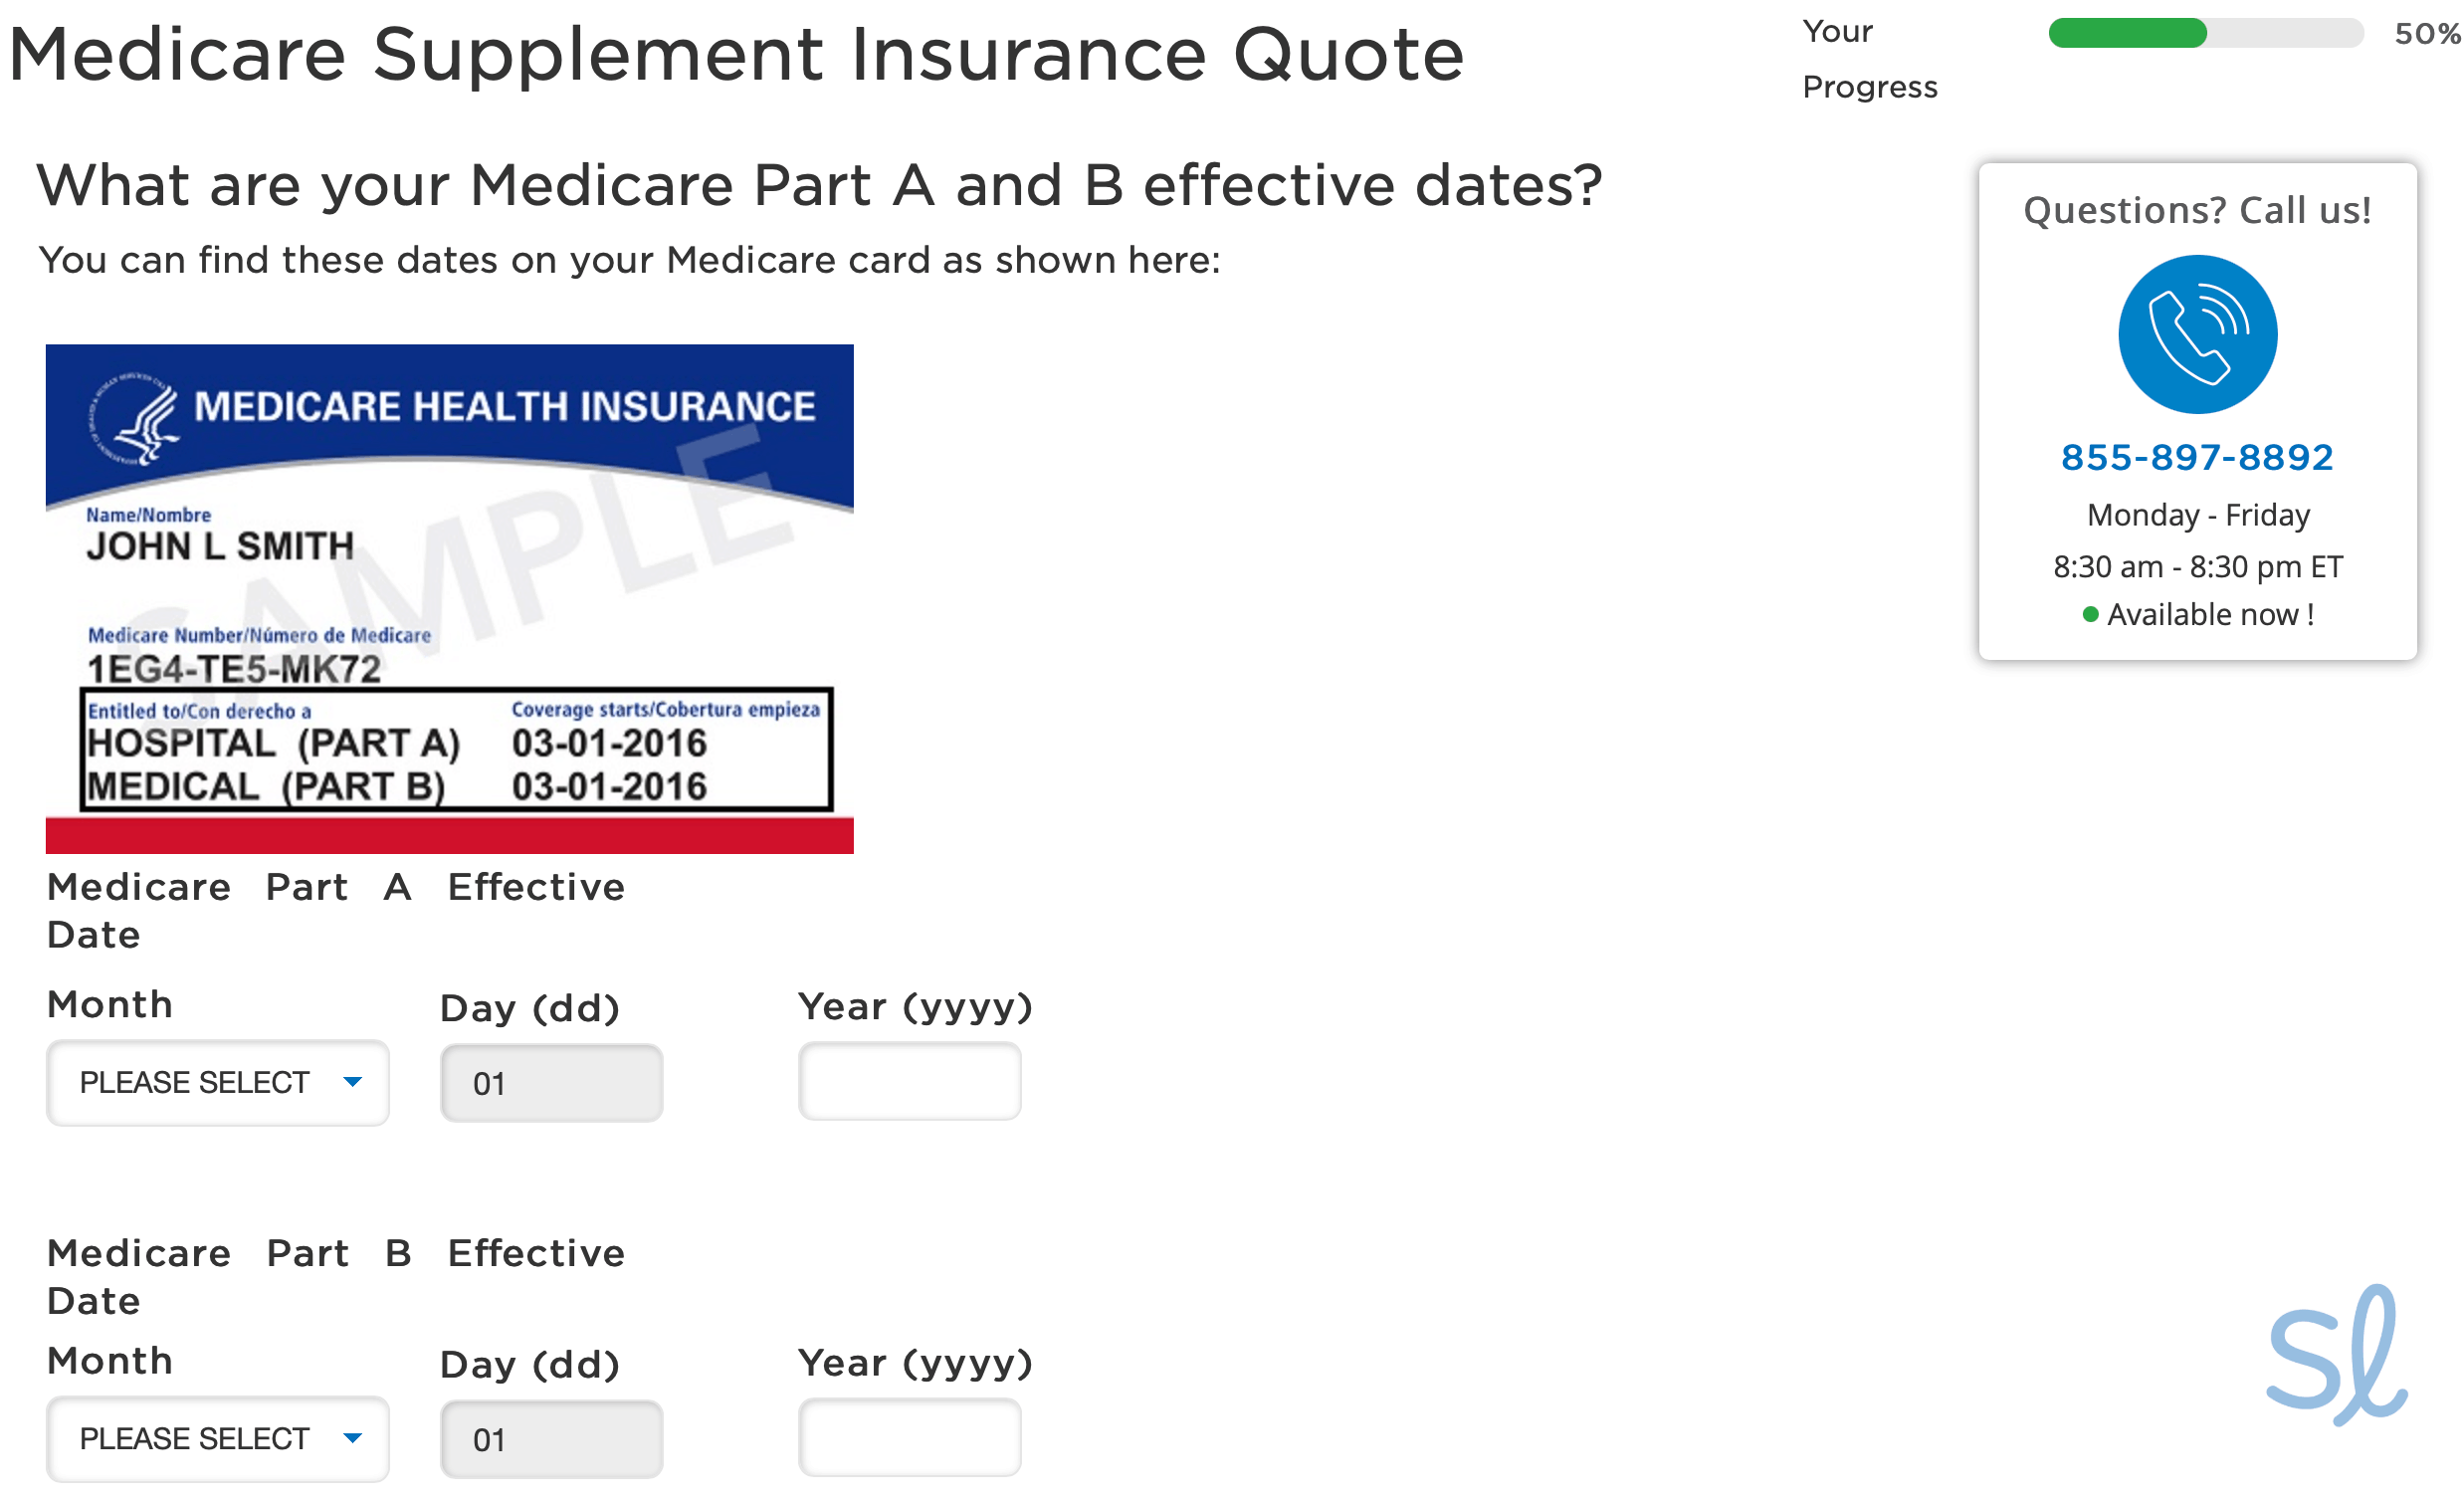 Input your Medicare information